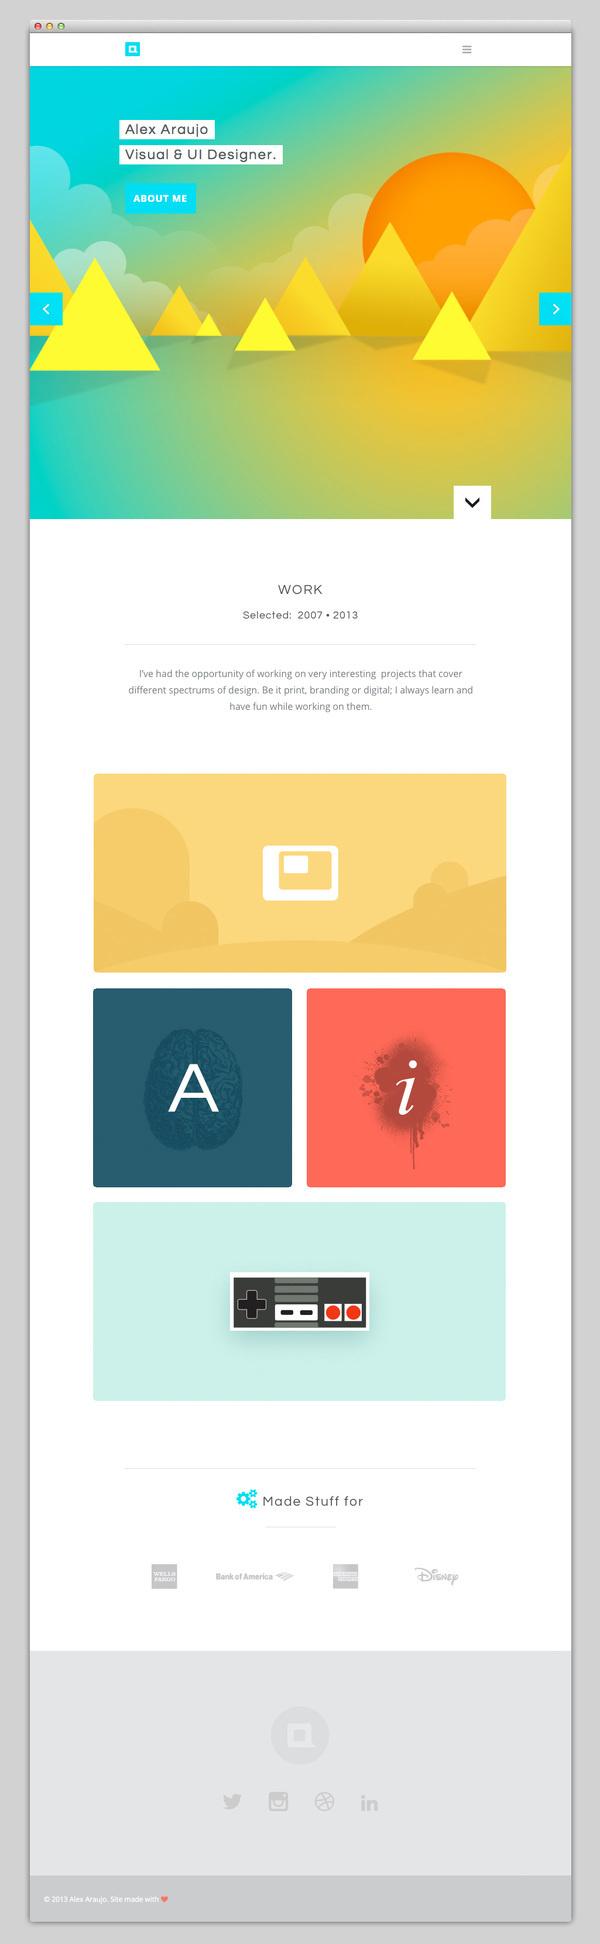 Alex Araujo #website #layout #design #web